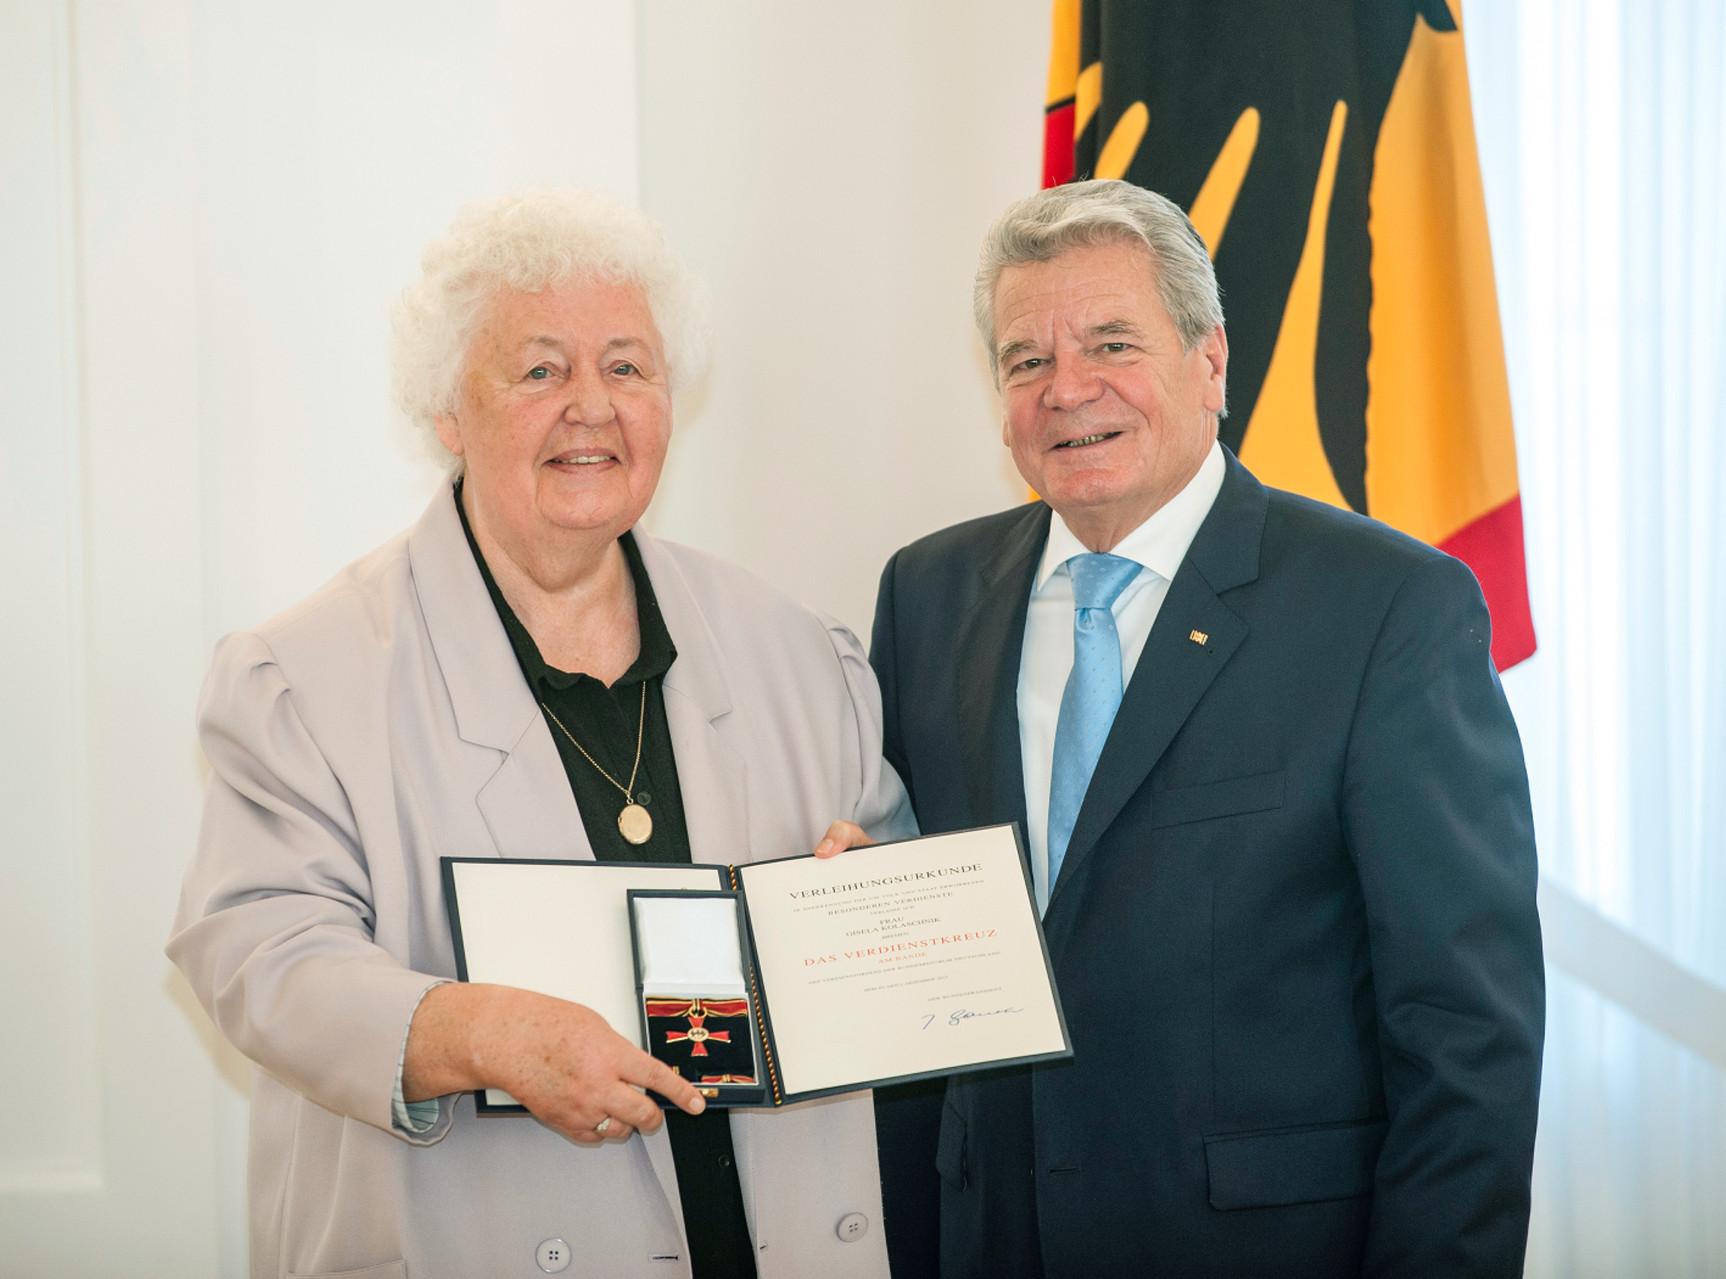 Verleihung Bundesverdienstkreuz an Gisela